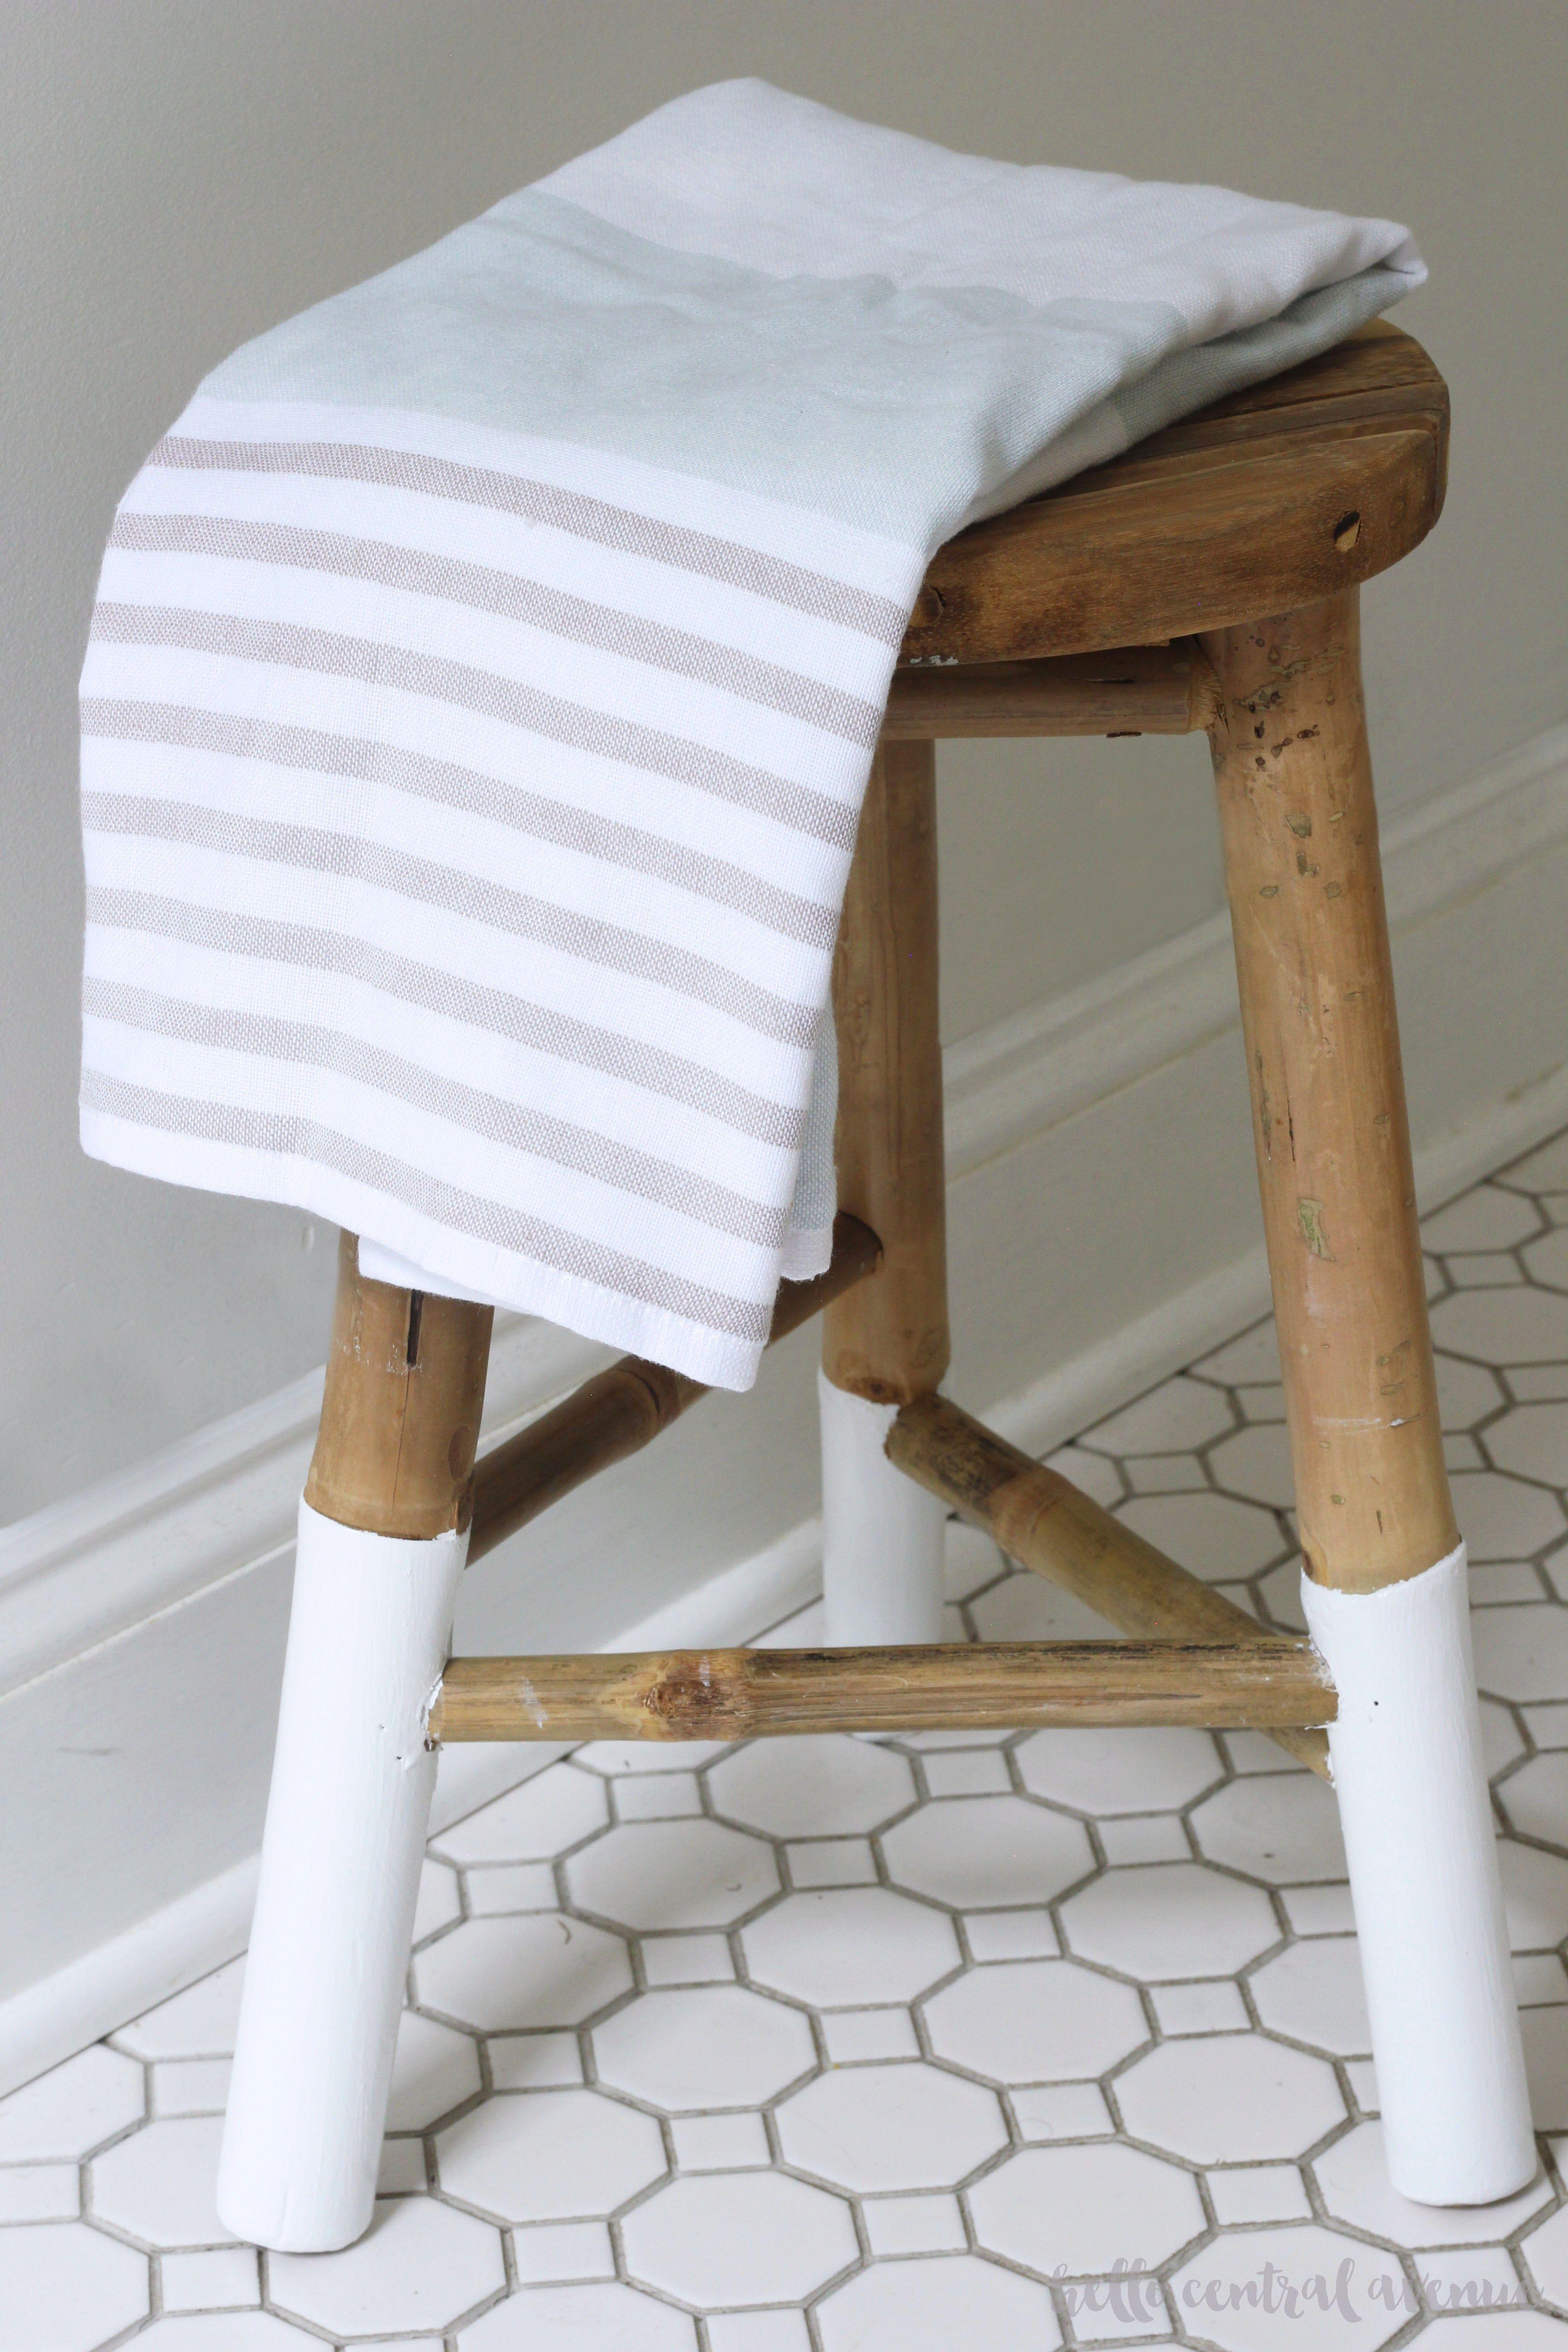 Enjoyable Serena Lily Knock Off Dip Dyed Wooden Stool H O M E Short Links Chair Design For Home Short Linksinfo